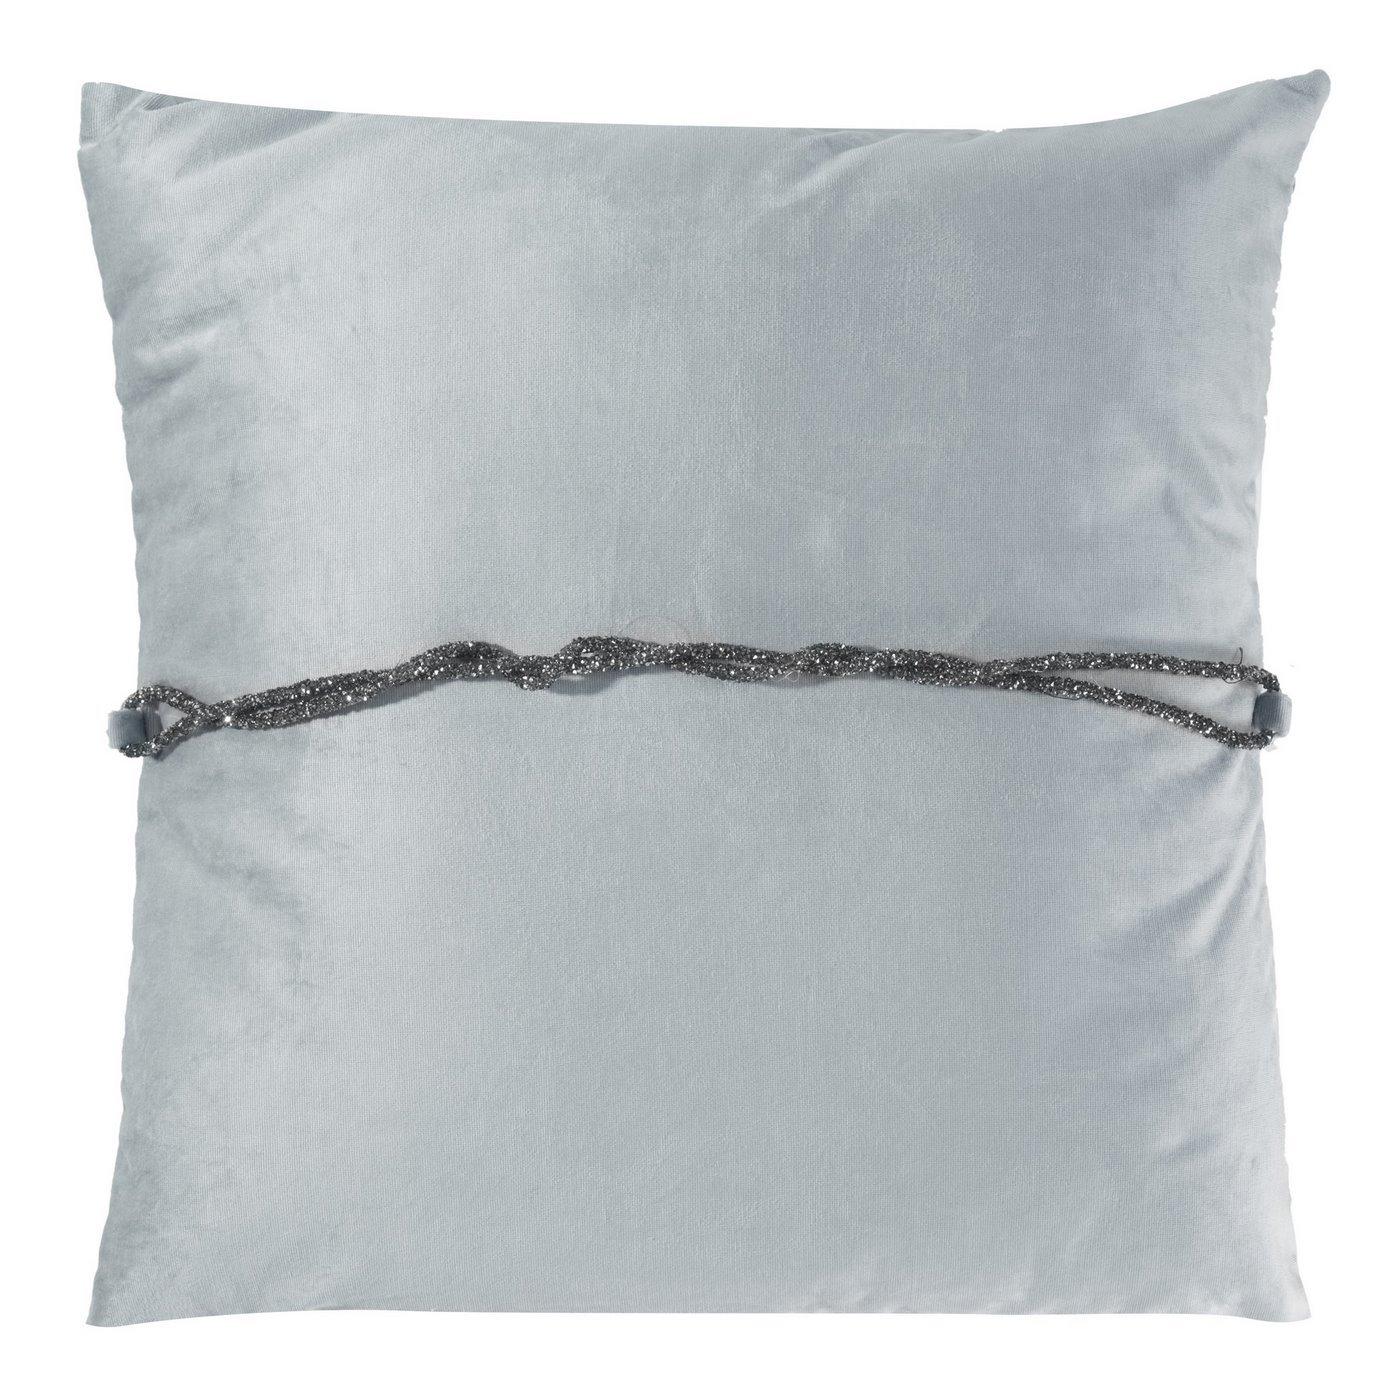 Poszewka na poduszkę 45 x 45 cm srebrna ze srebrnym paskiem